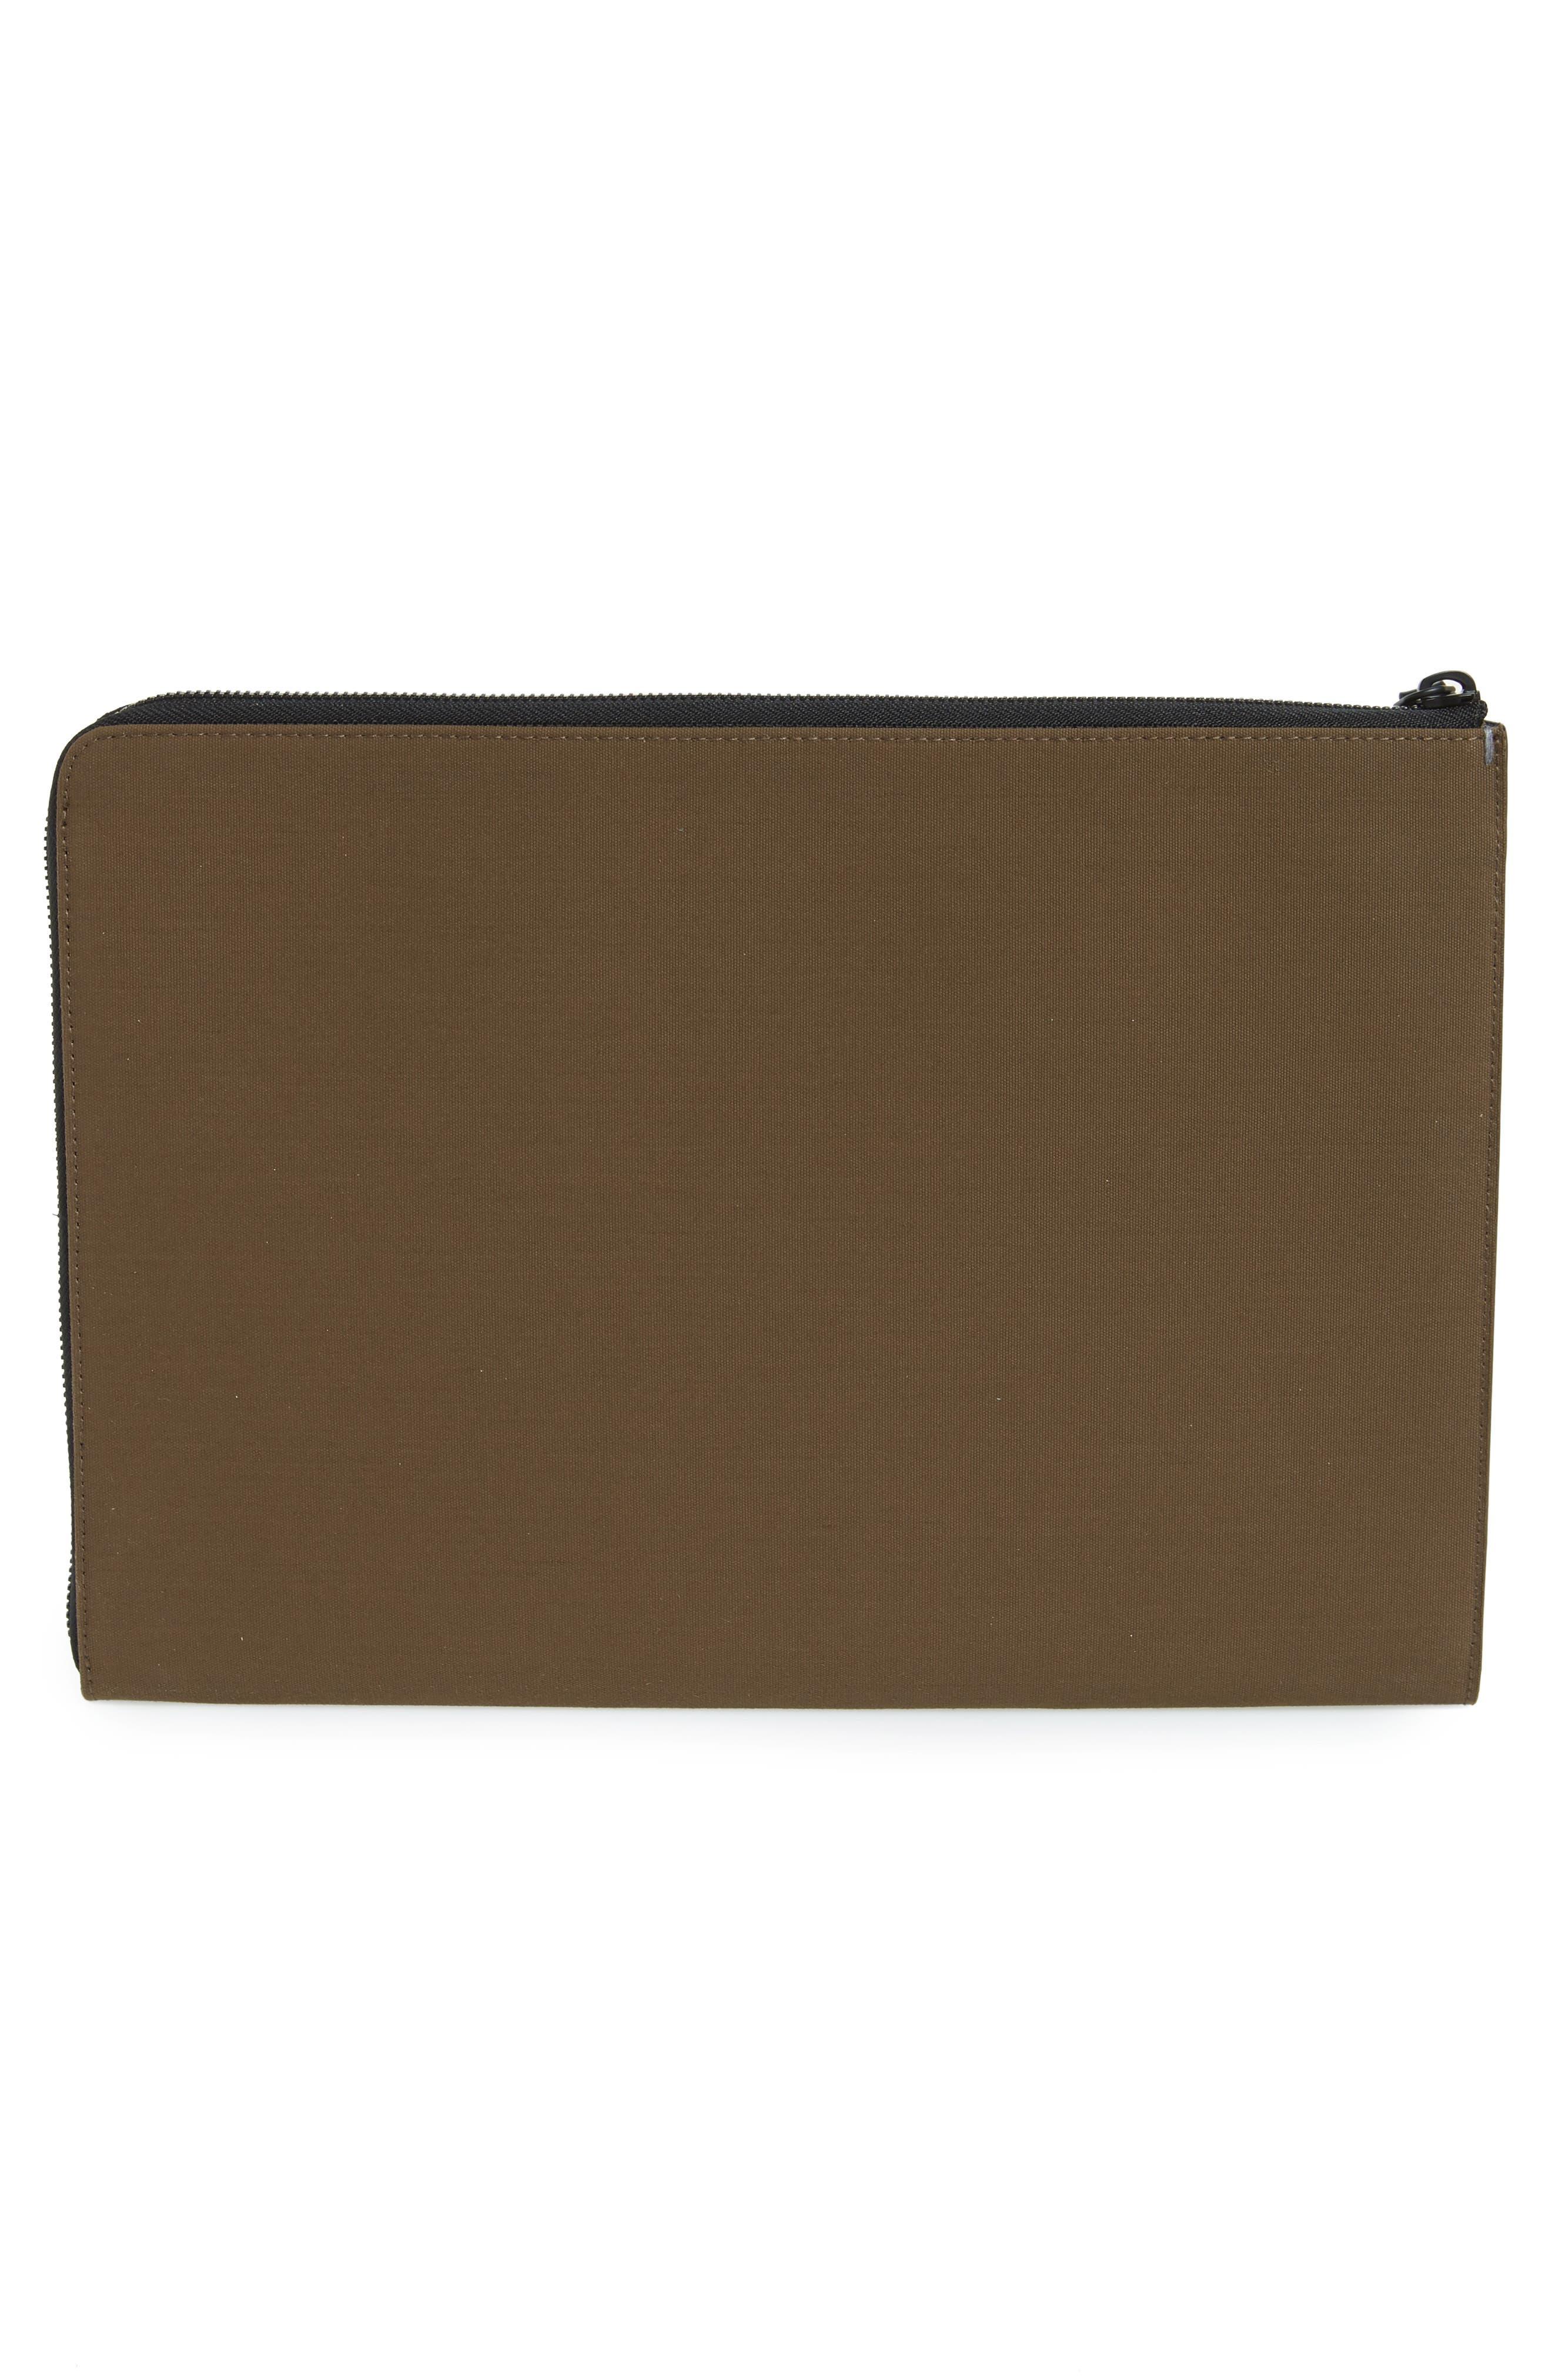 Portfolio Case,                             Alternate thumbnail 2, color,                             Khaki Canvas/ Black Leather